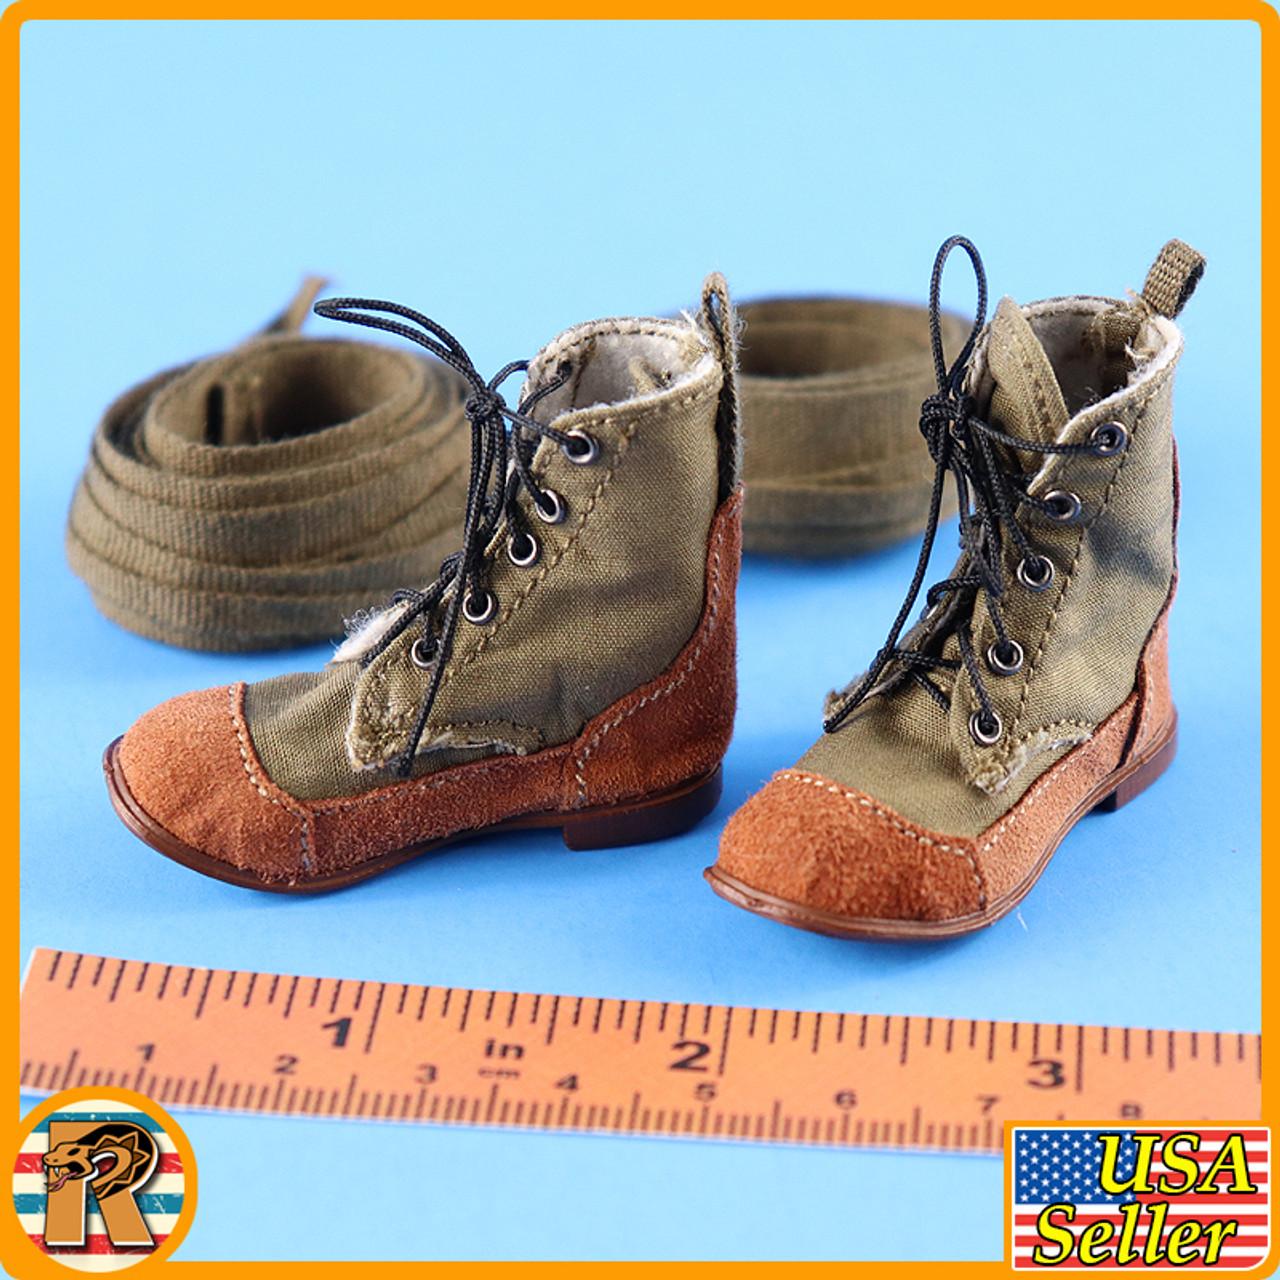 1938 Battle of Hailar - Boots (for Feet) w/ Leggings - 1/6 Scale -